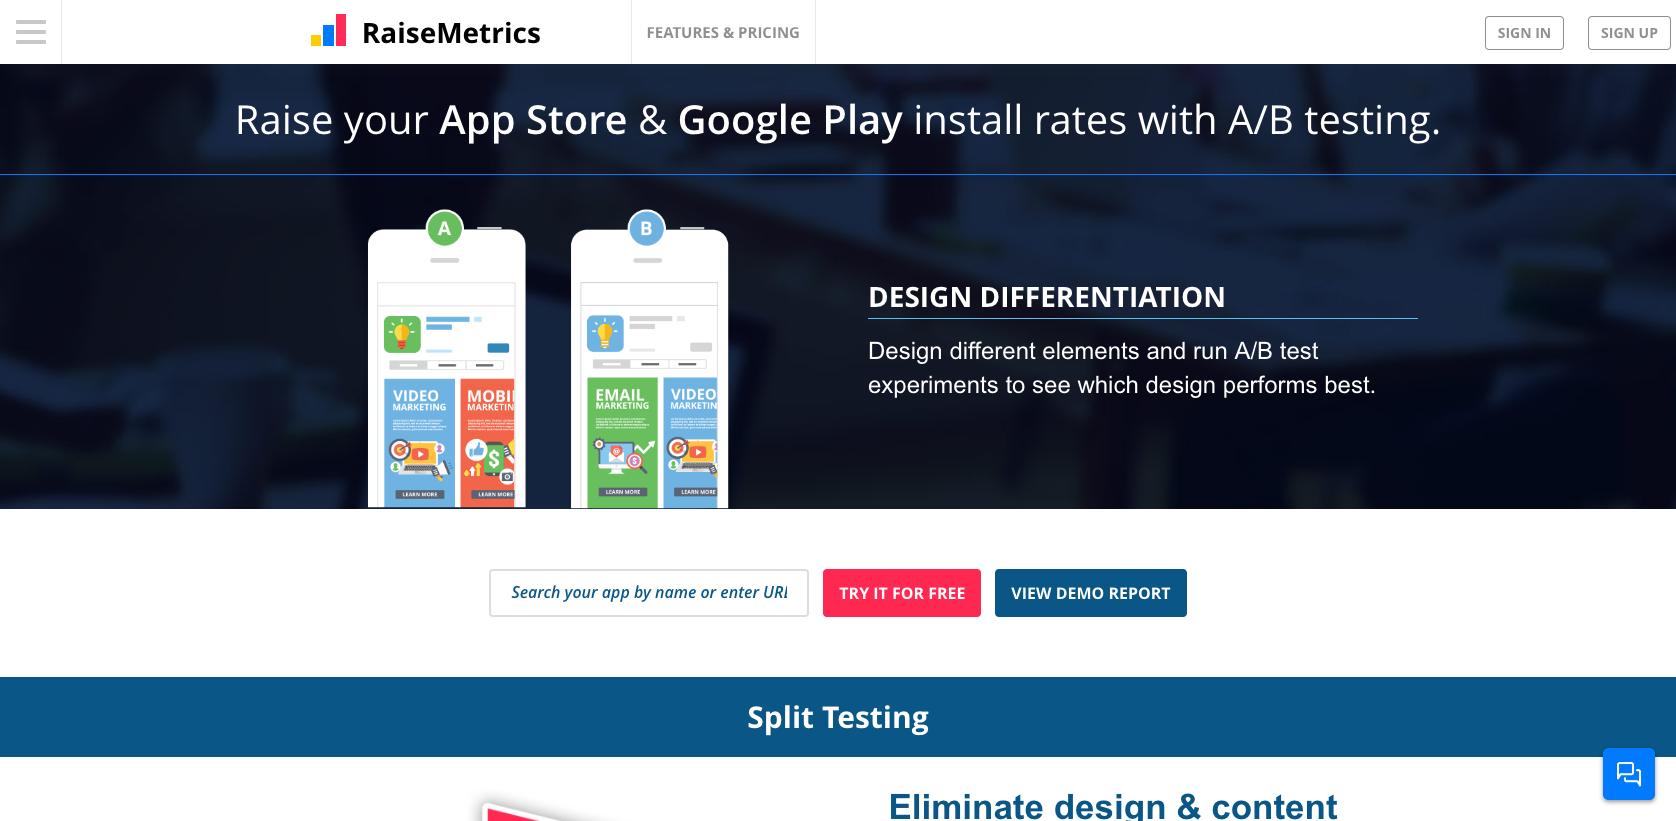 RaiseMetrics A/B testing tool